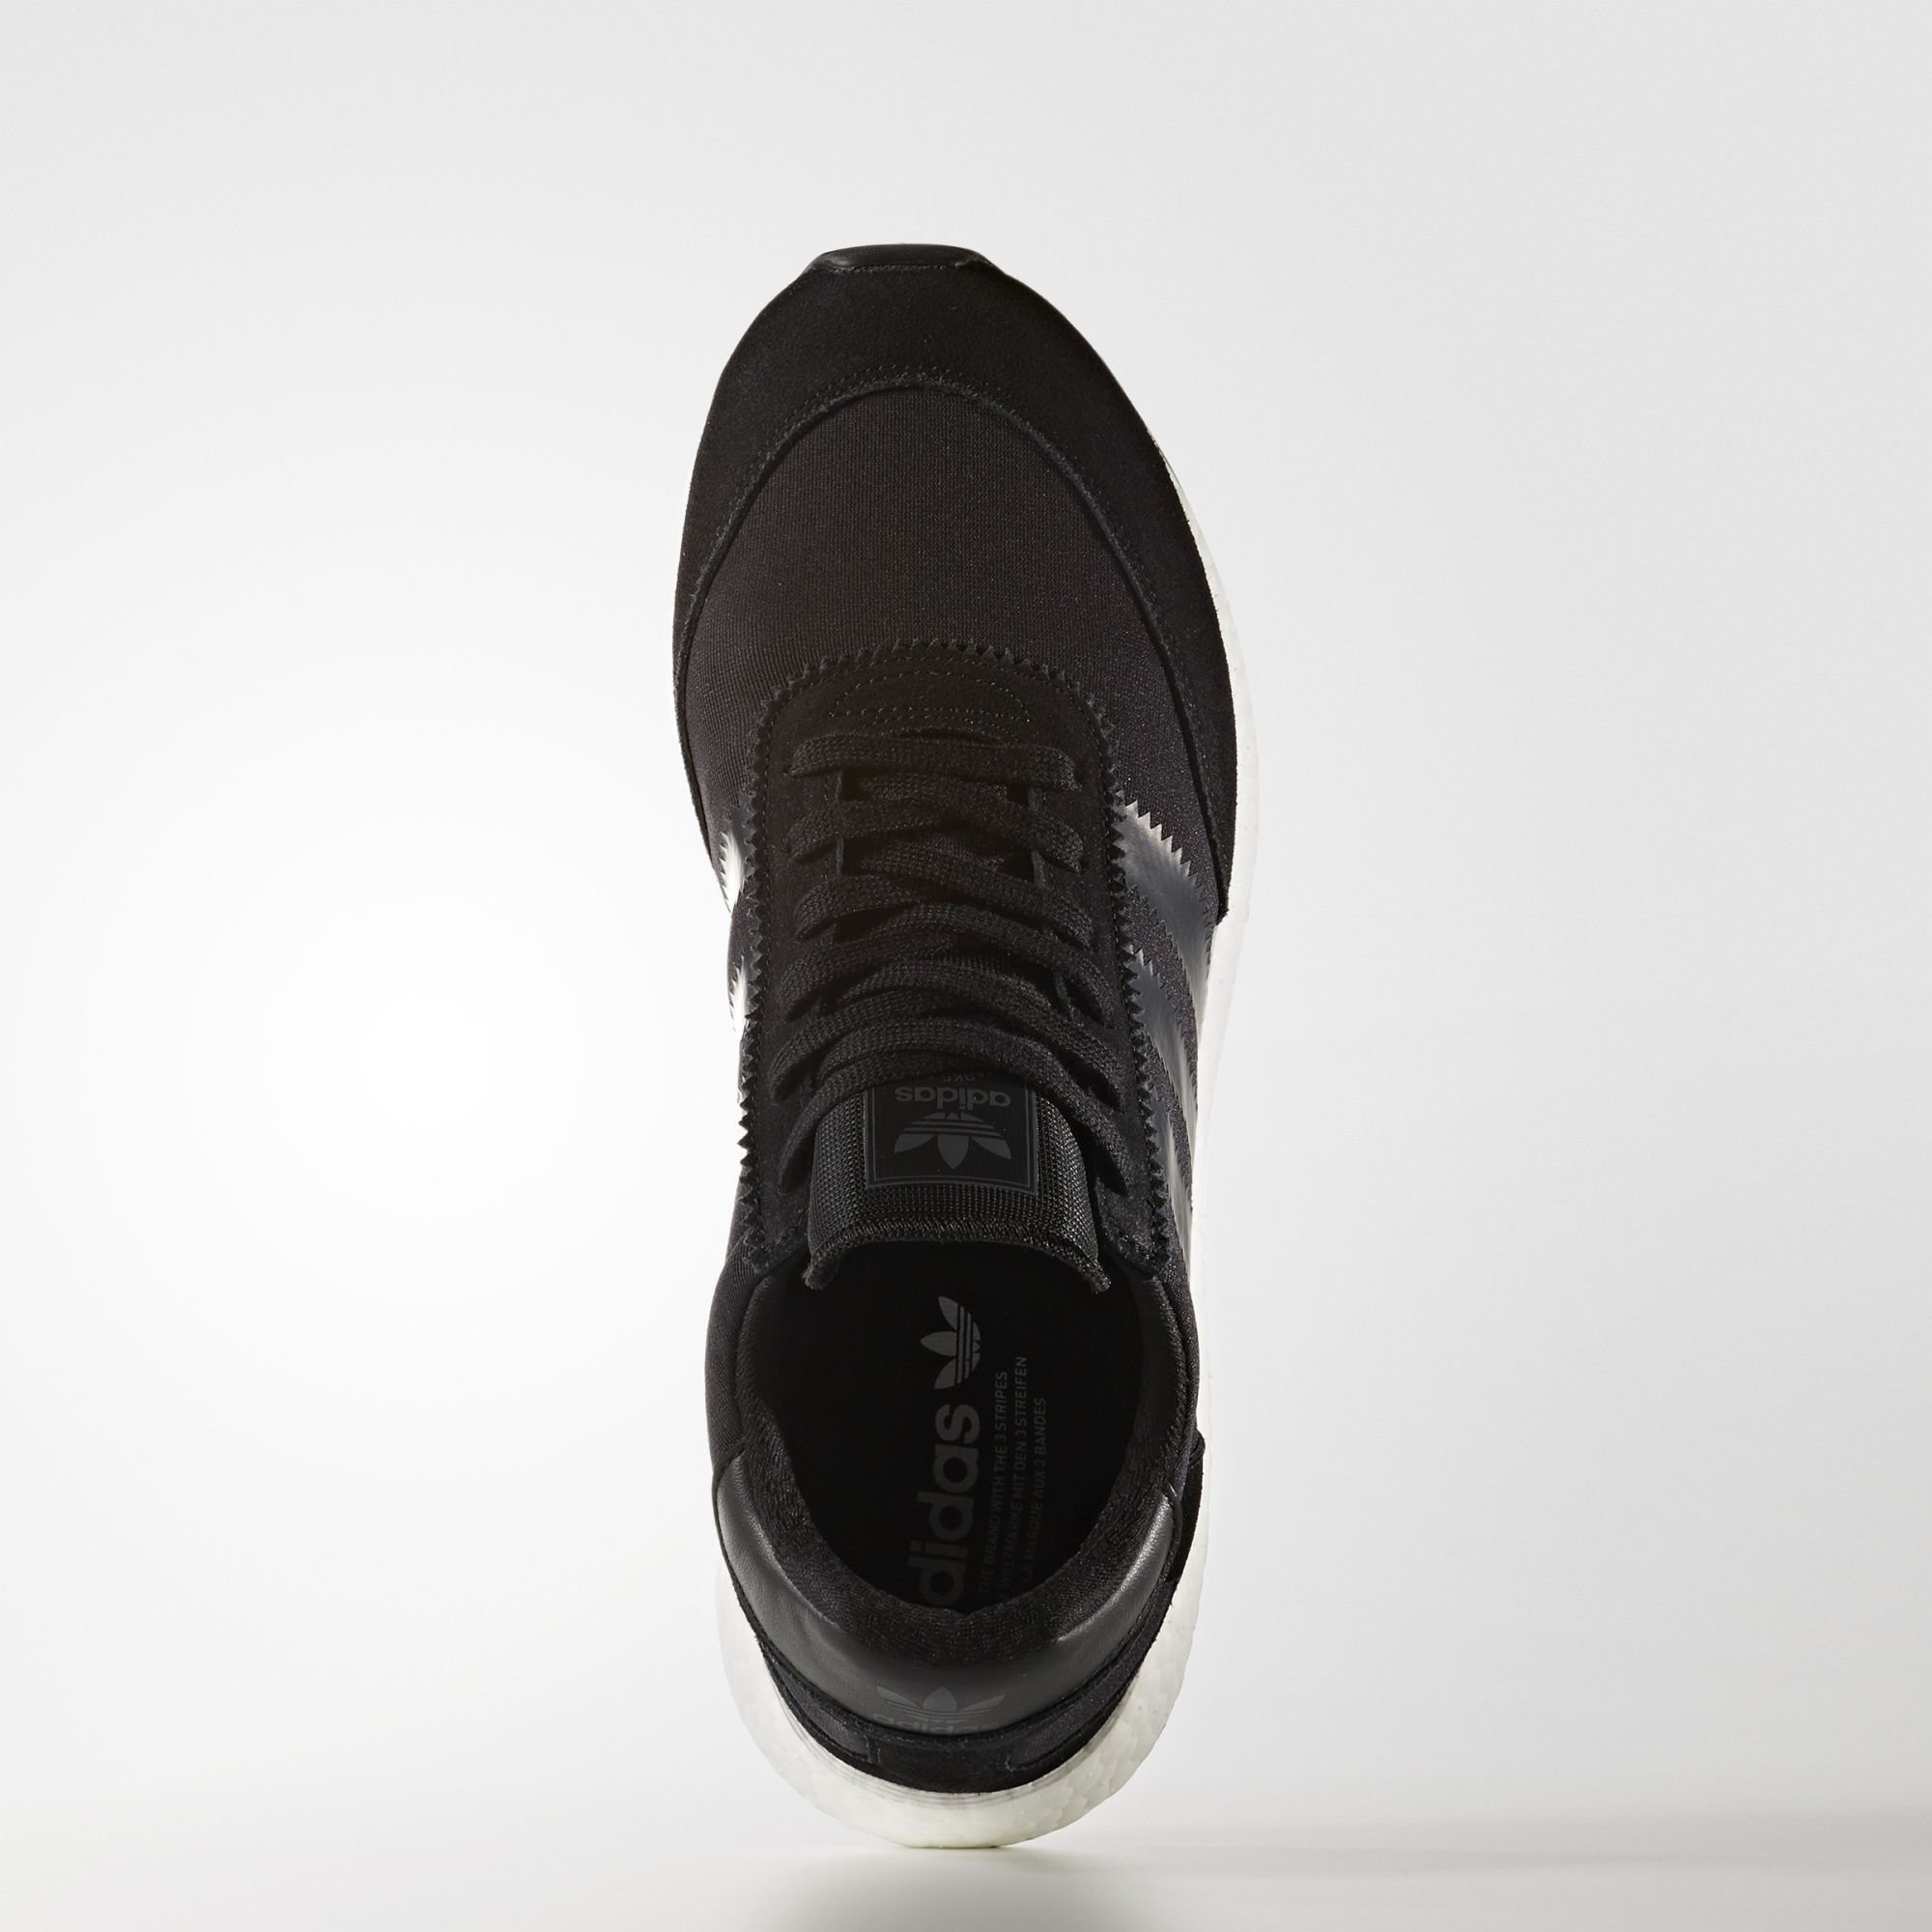 adidas Iniki Runner Black White (BB2100)